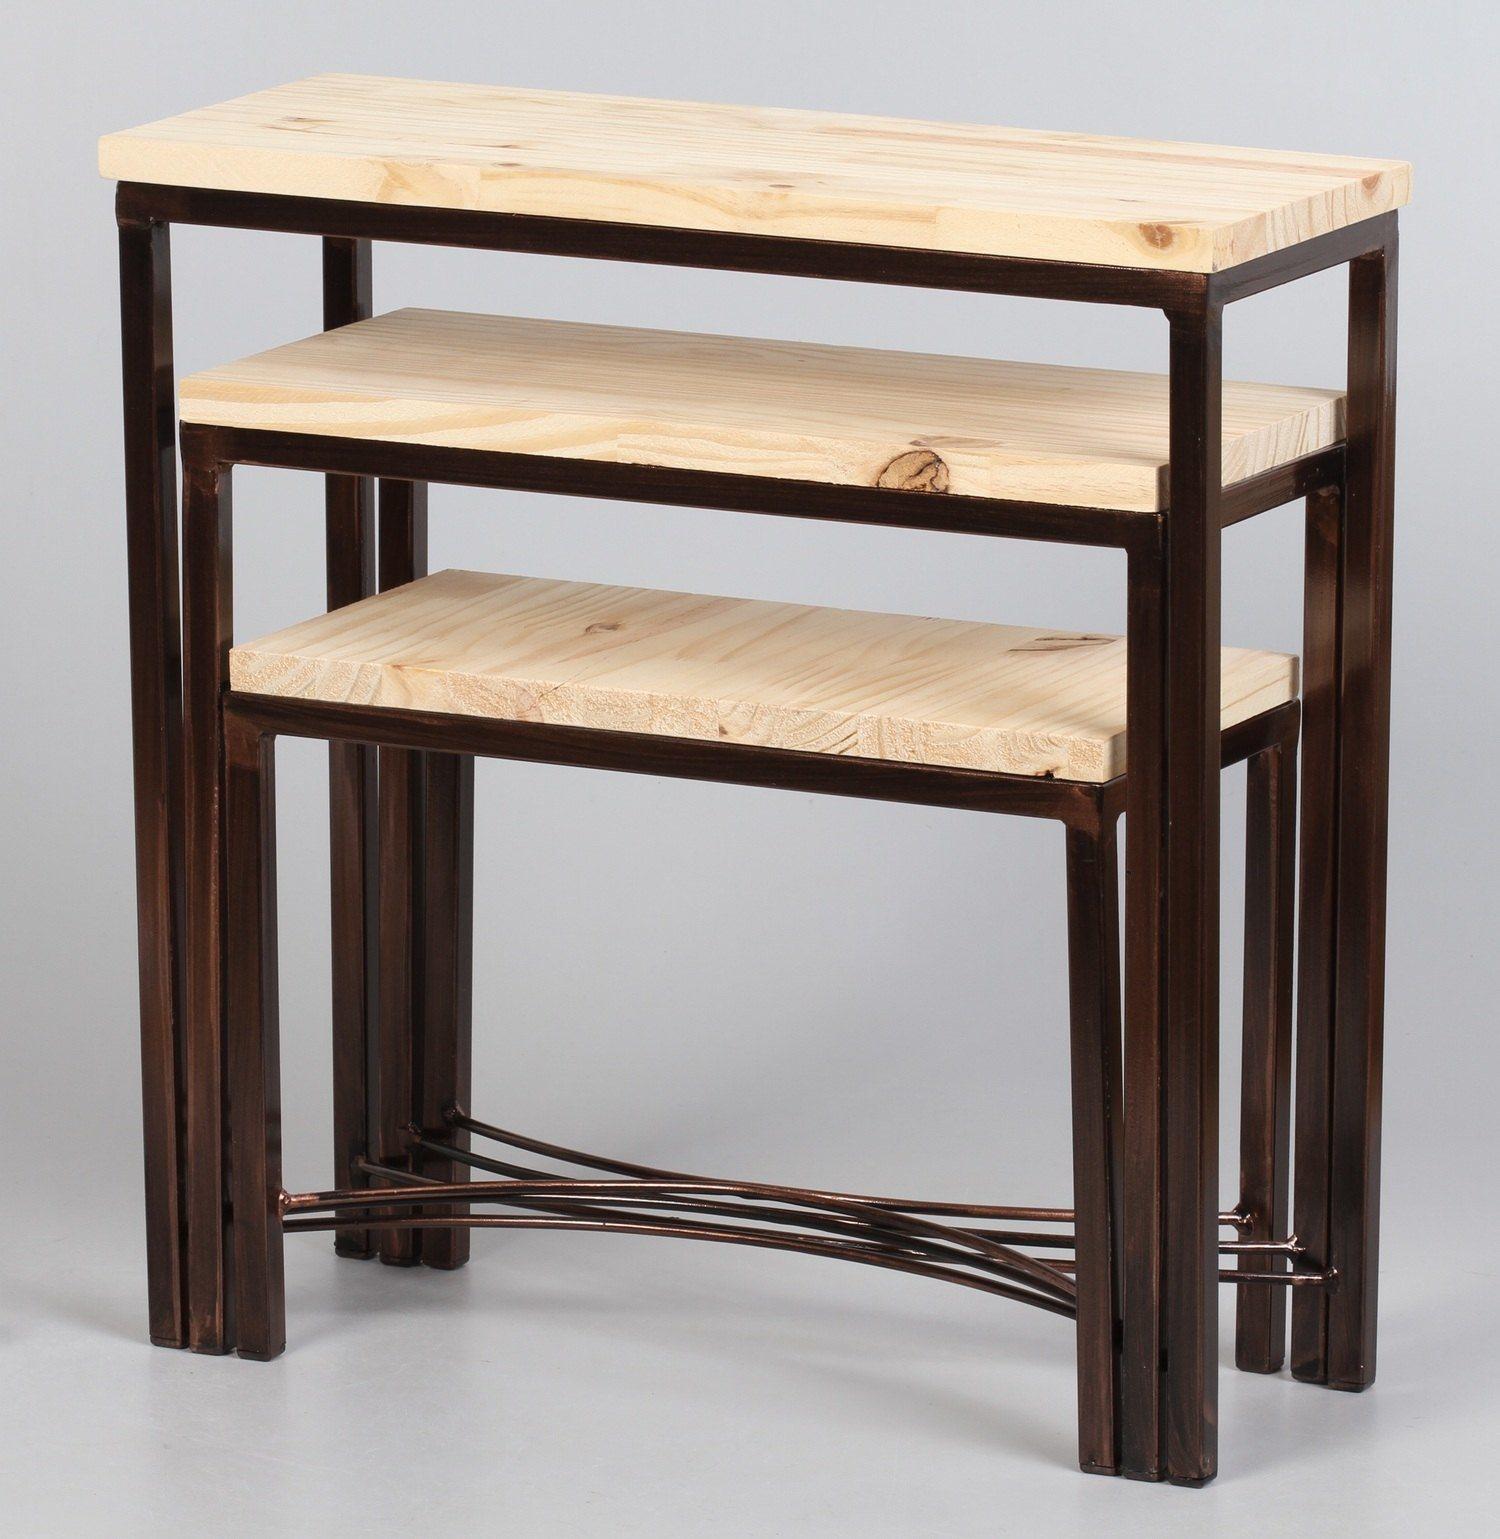 Kit com 03 Mini Table Encaixável, Pé em X na Cor Cobre